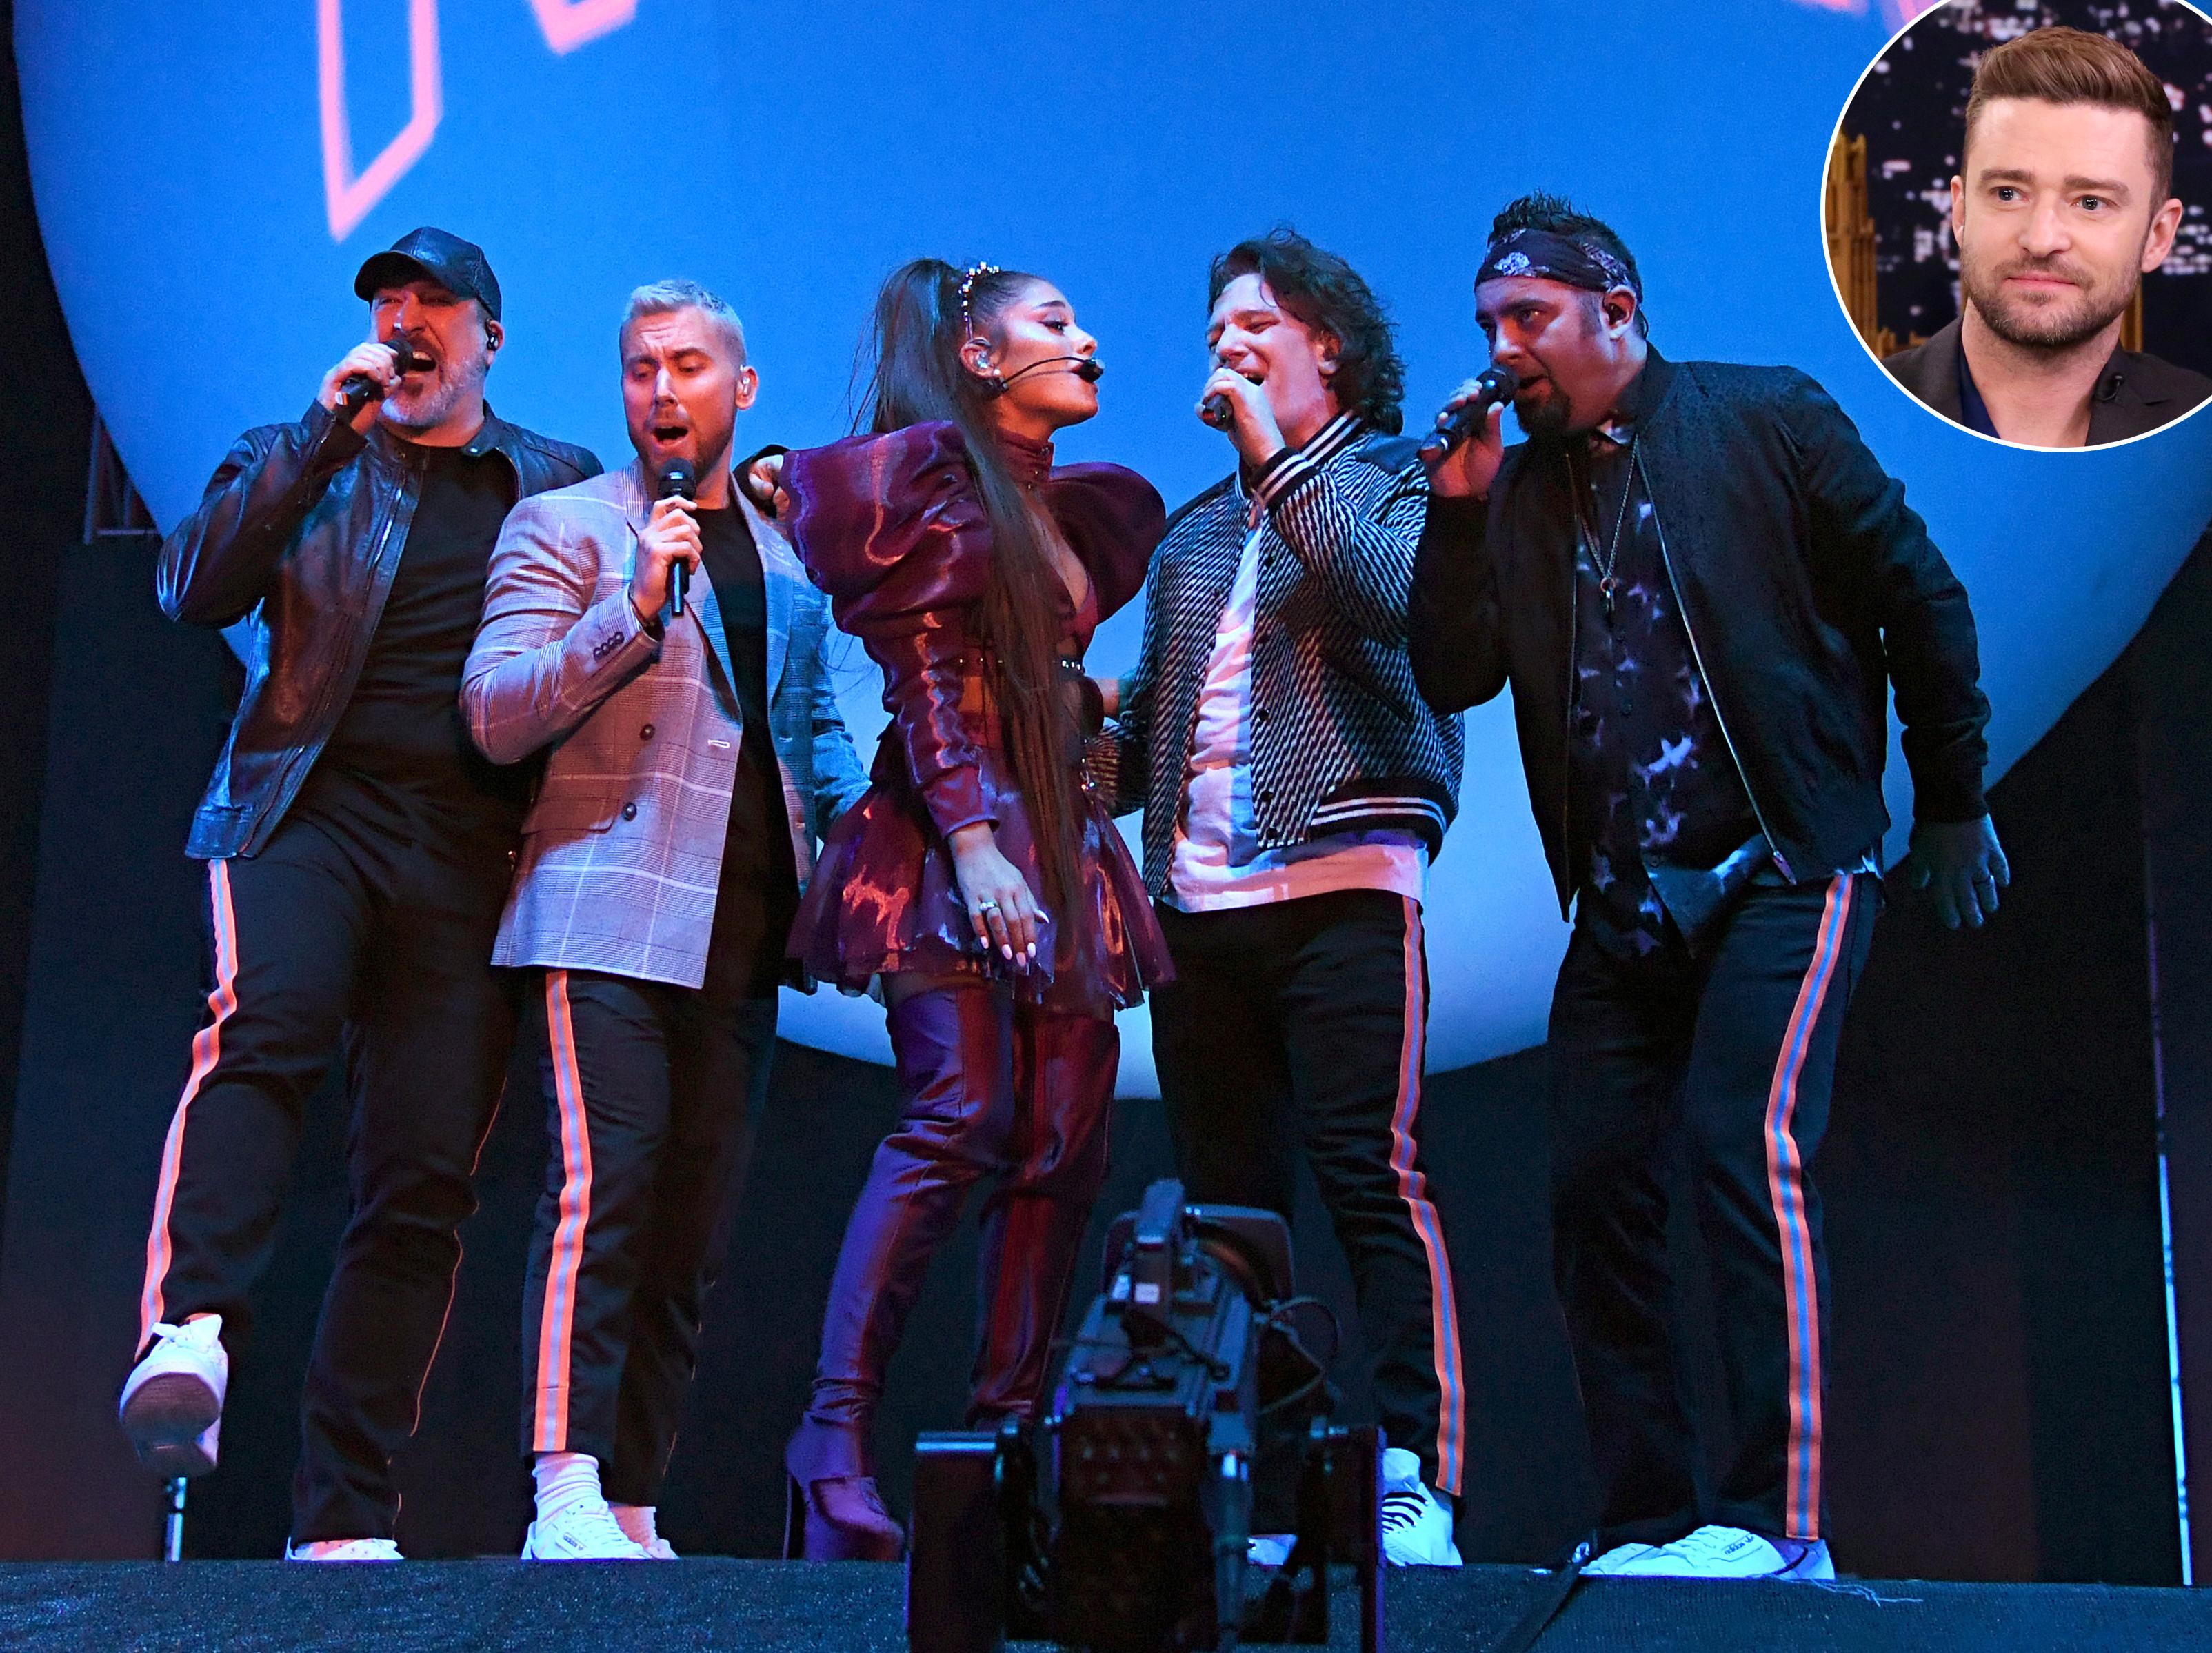 Justin Timberlake Coachella Ariana Grande NSync.jpg - Ariana Grande, Joey Fatone, Lance Bass, JC Chasez, and Chris Kirkpatrick, and Justin Timberlake.